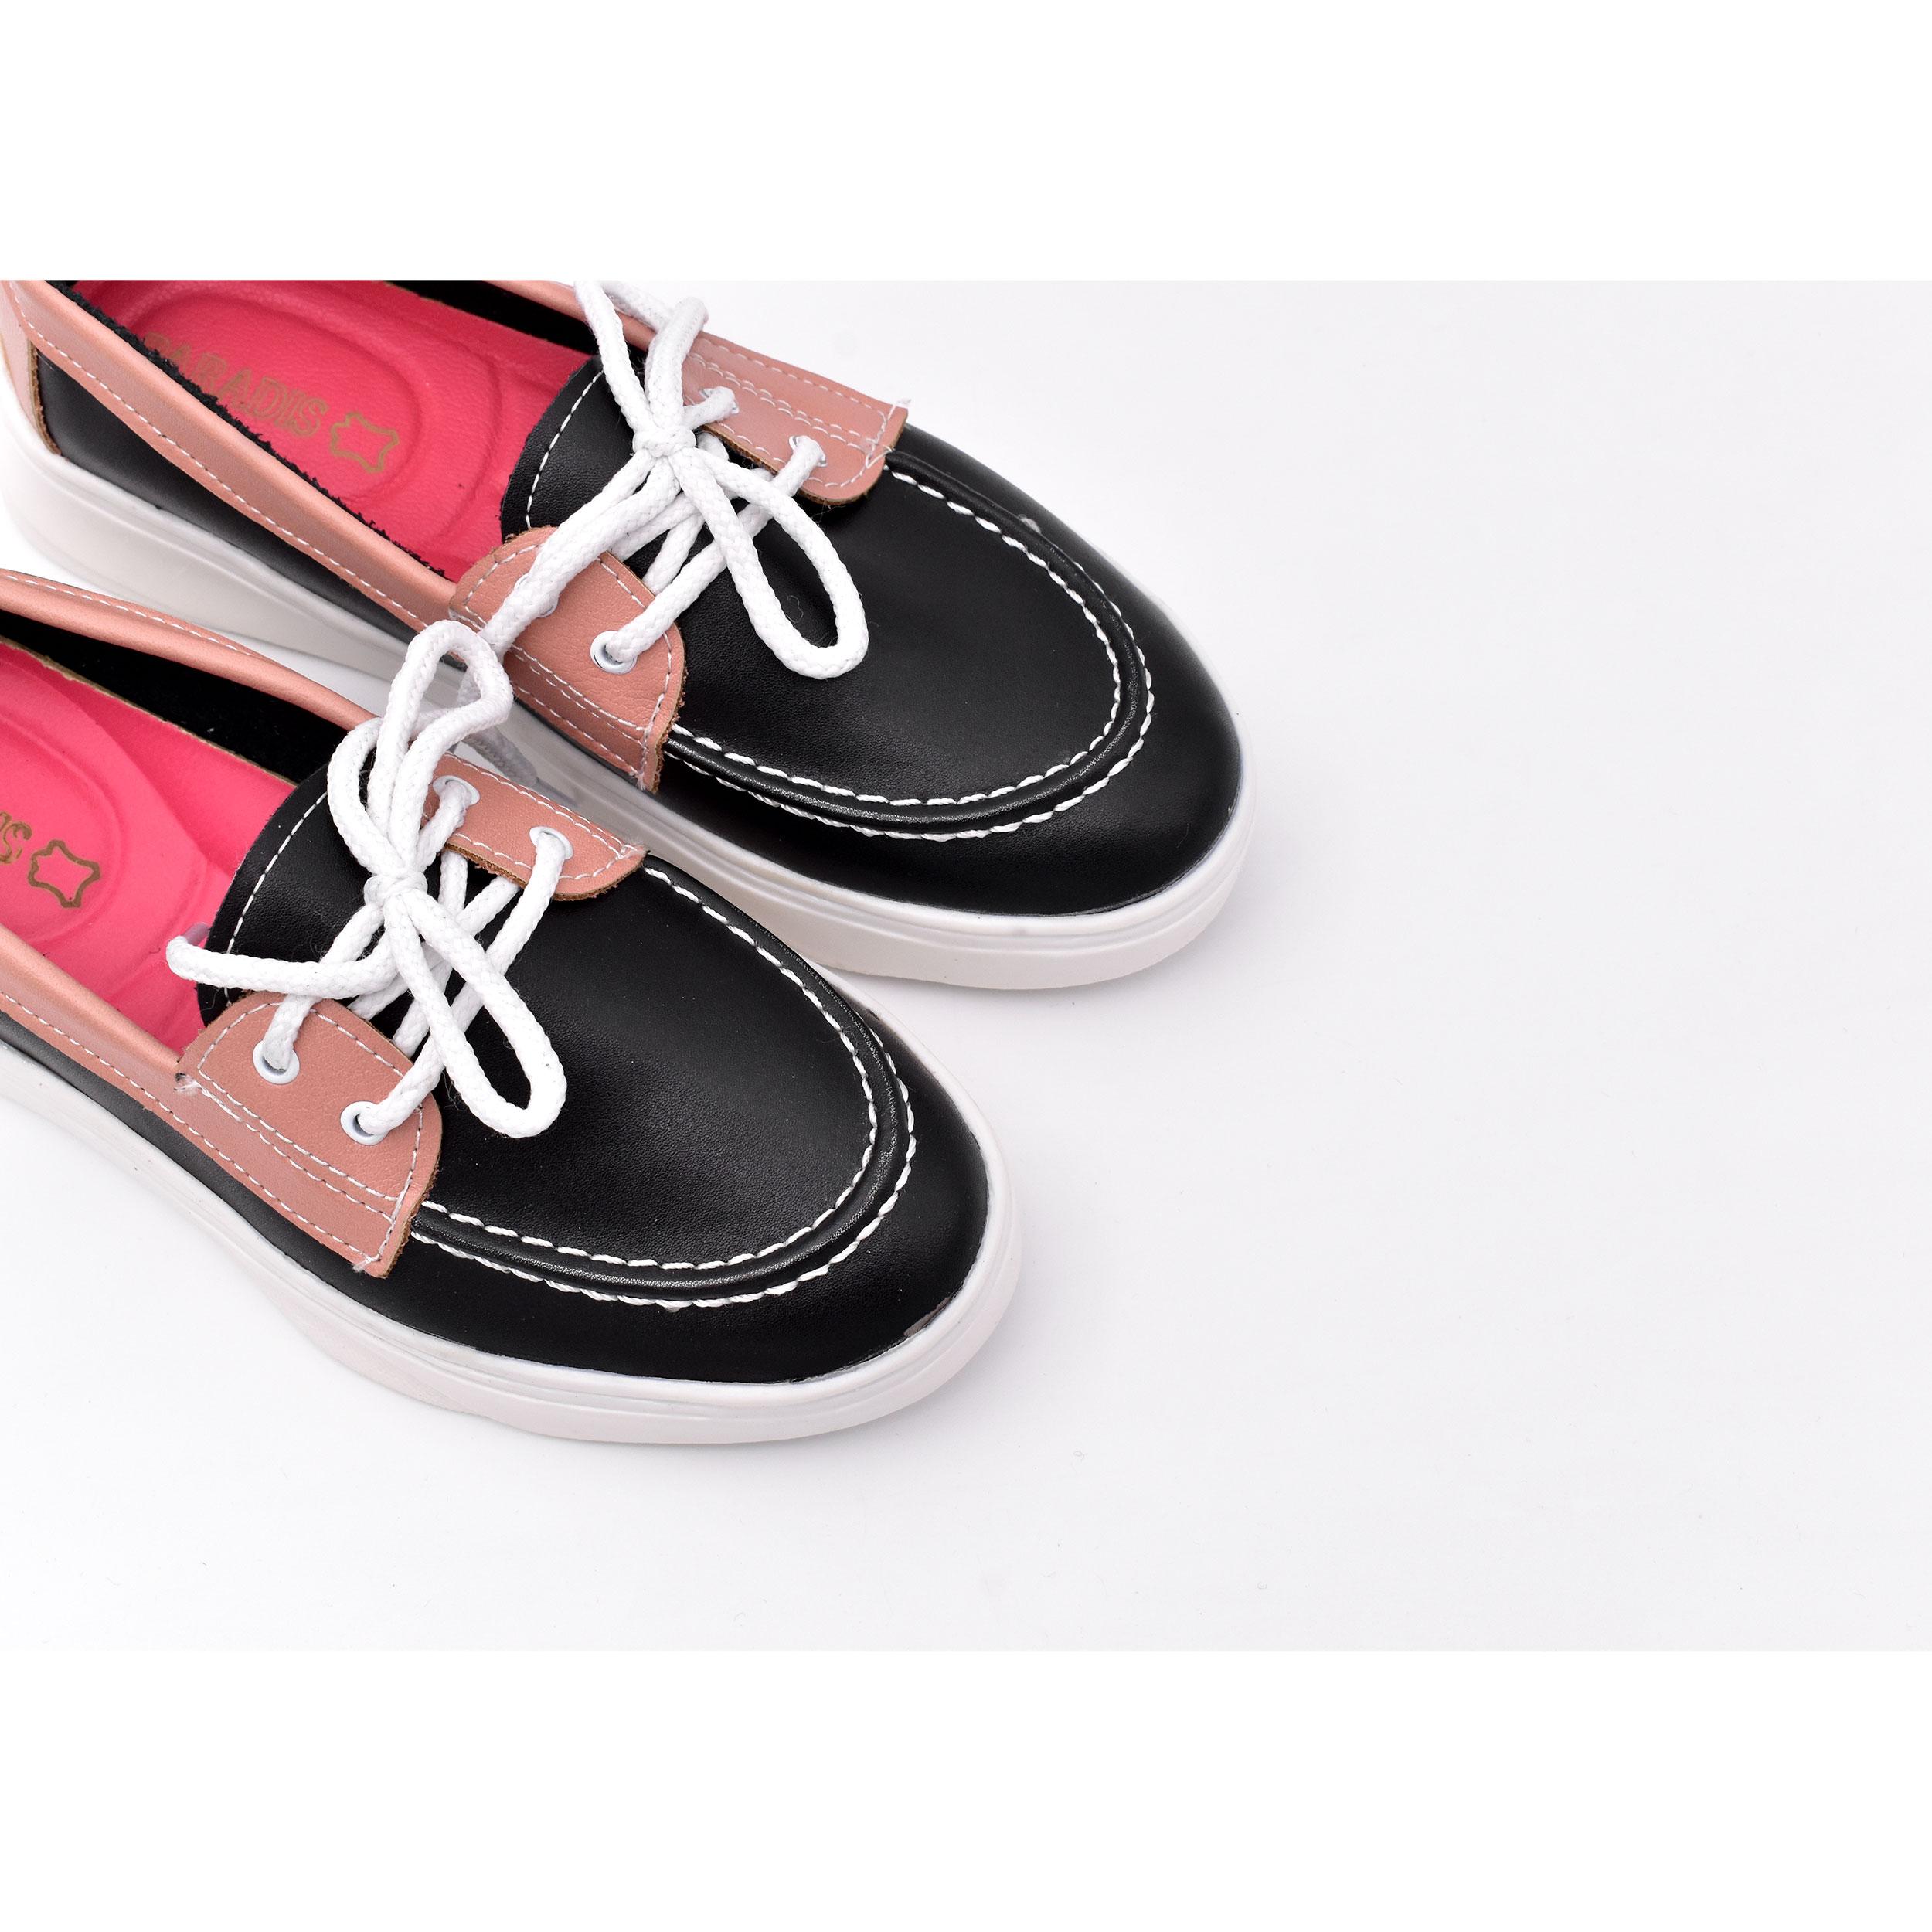 کفش روزمره زنانه کد 8740                     غیر اصل